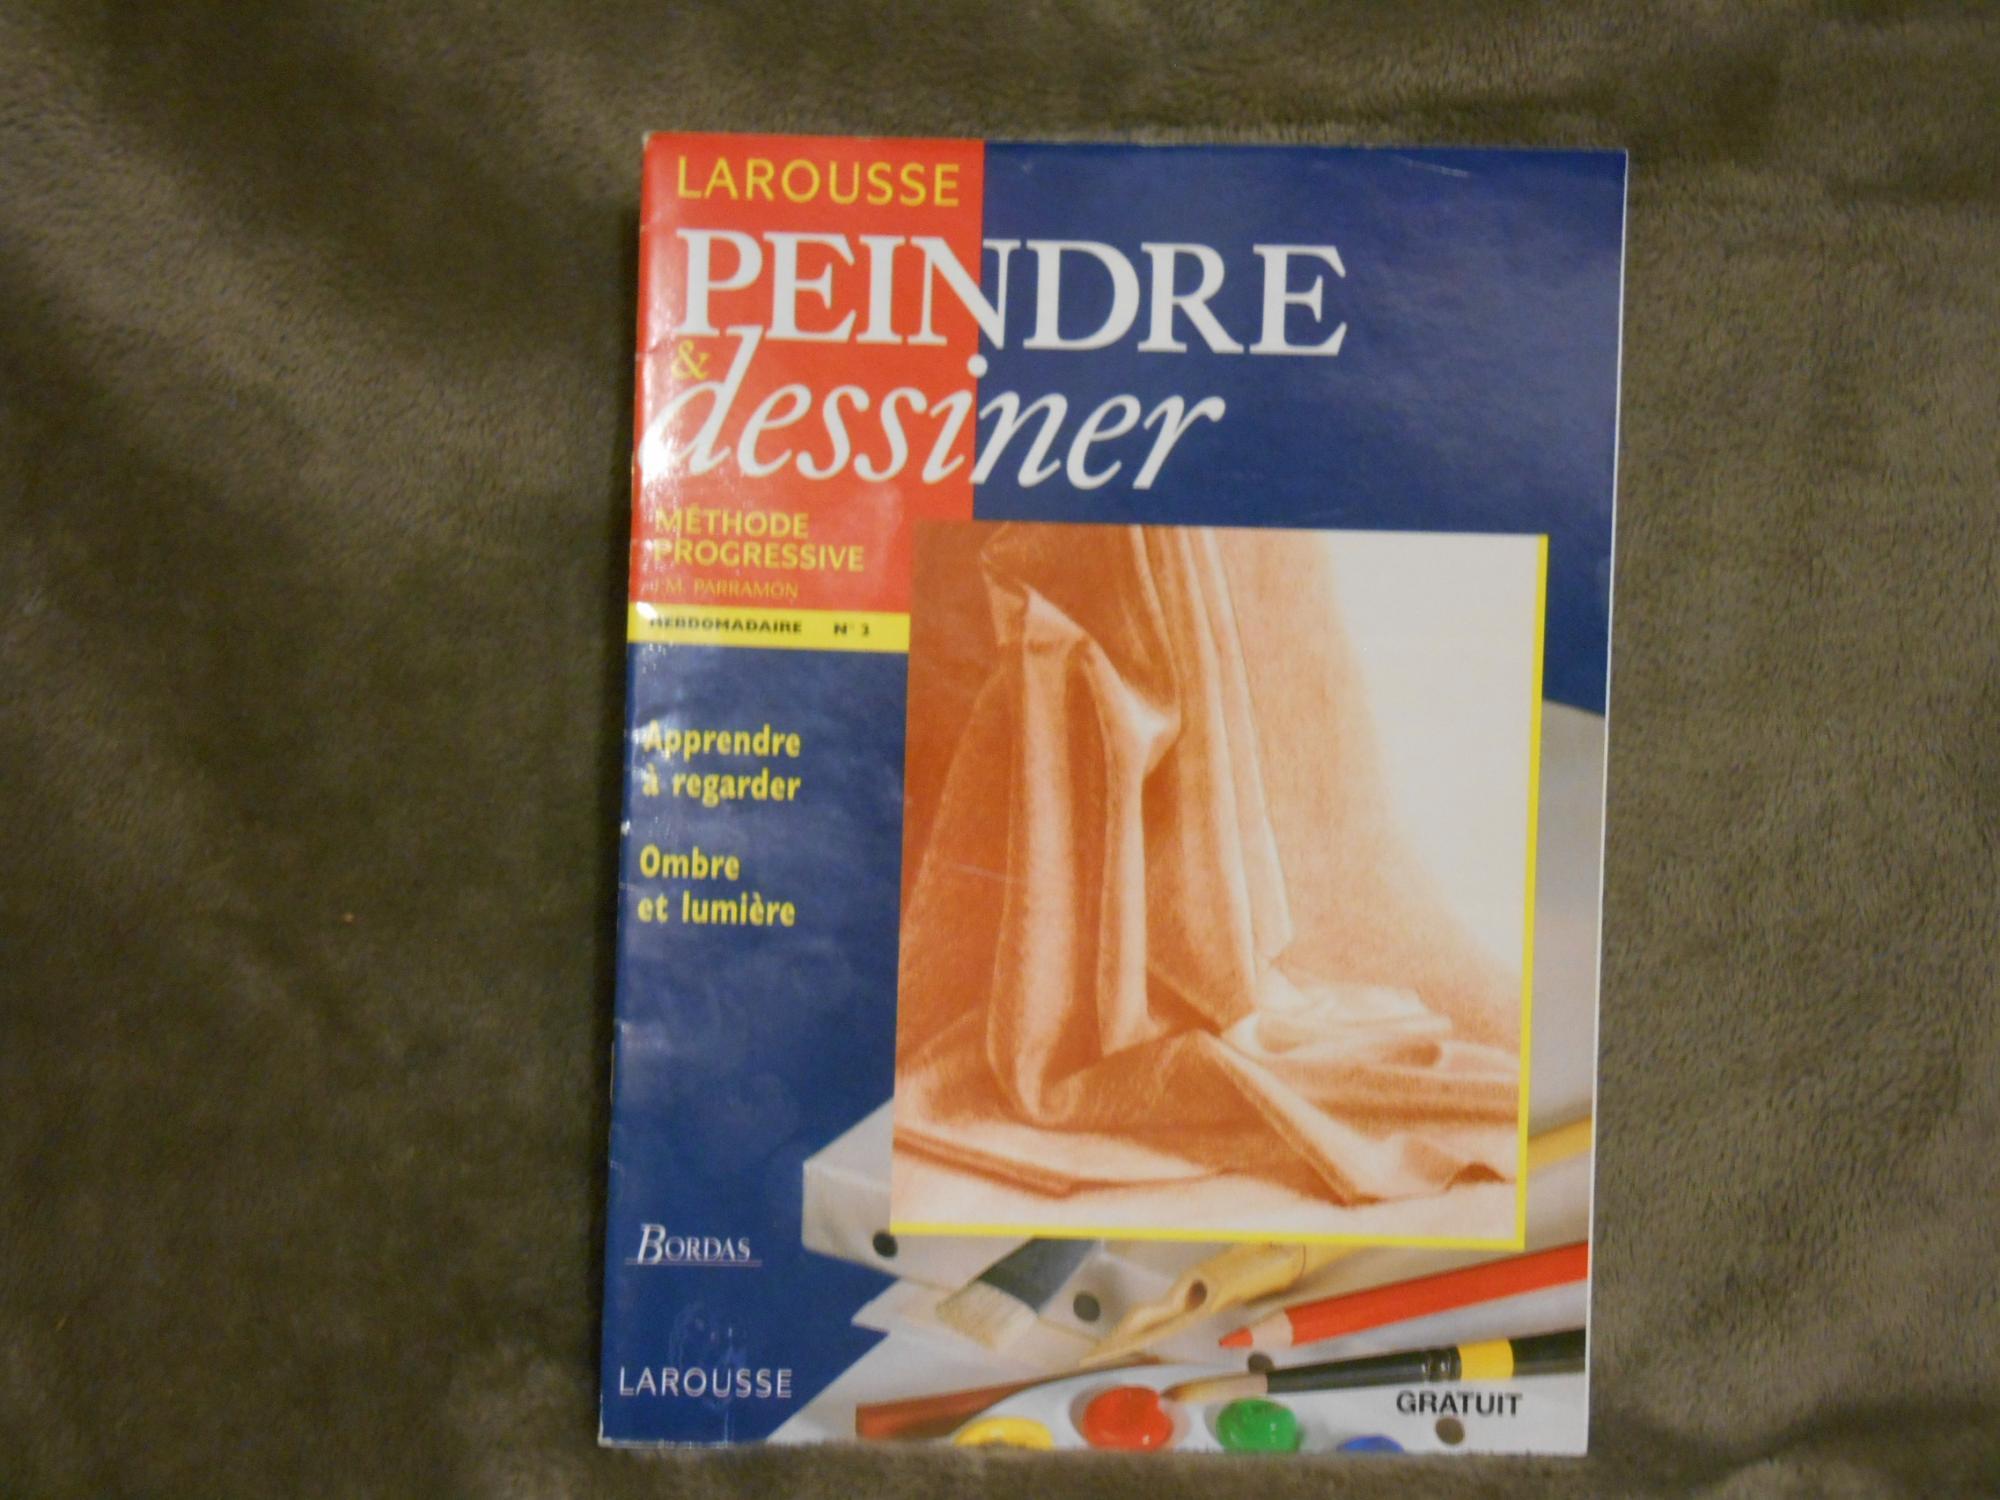 Magazine Apprendre La Photo larousse peindre et dessiner methode